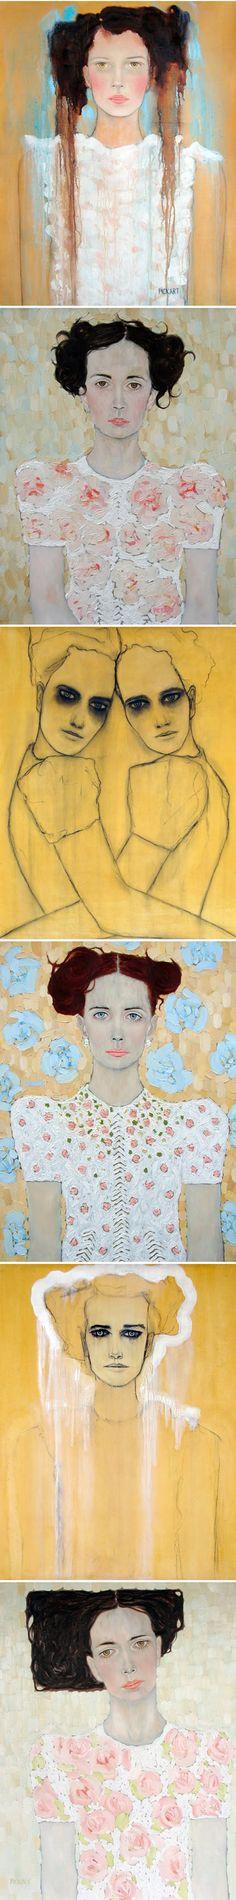 Ryan Pickart - love these portraits - especially the rectangular hair.